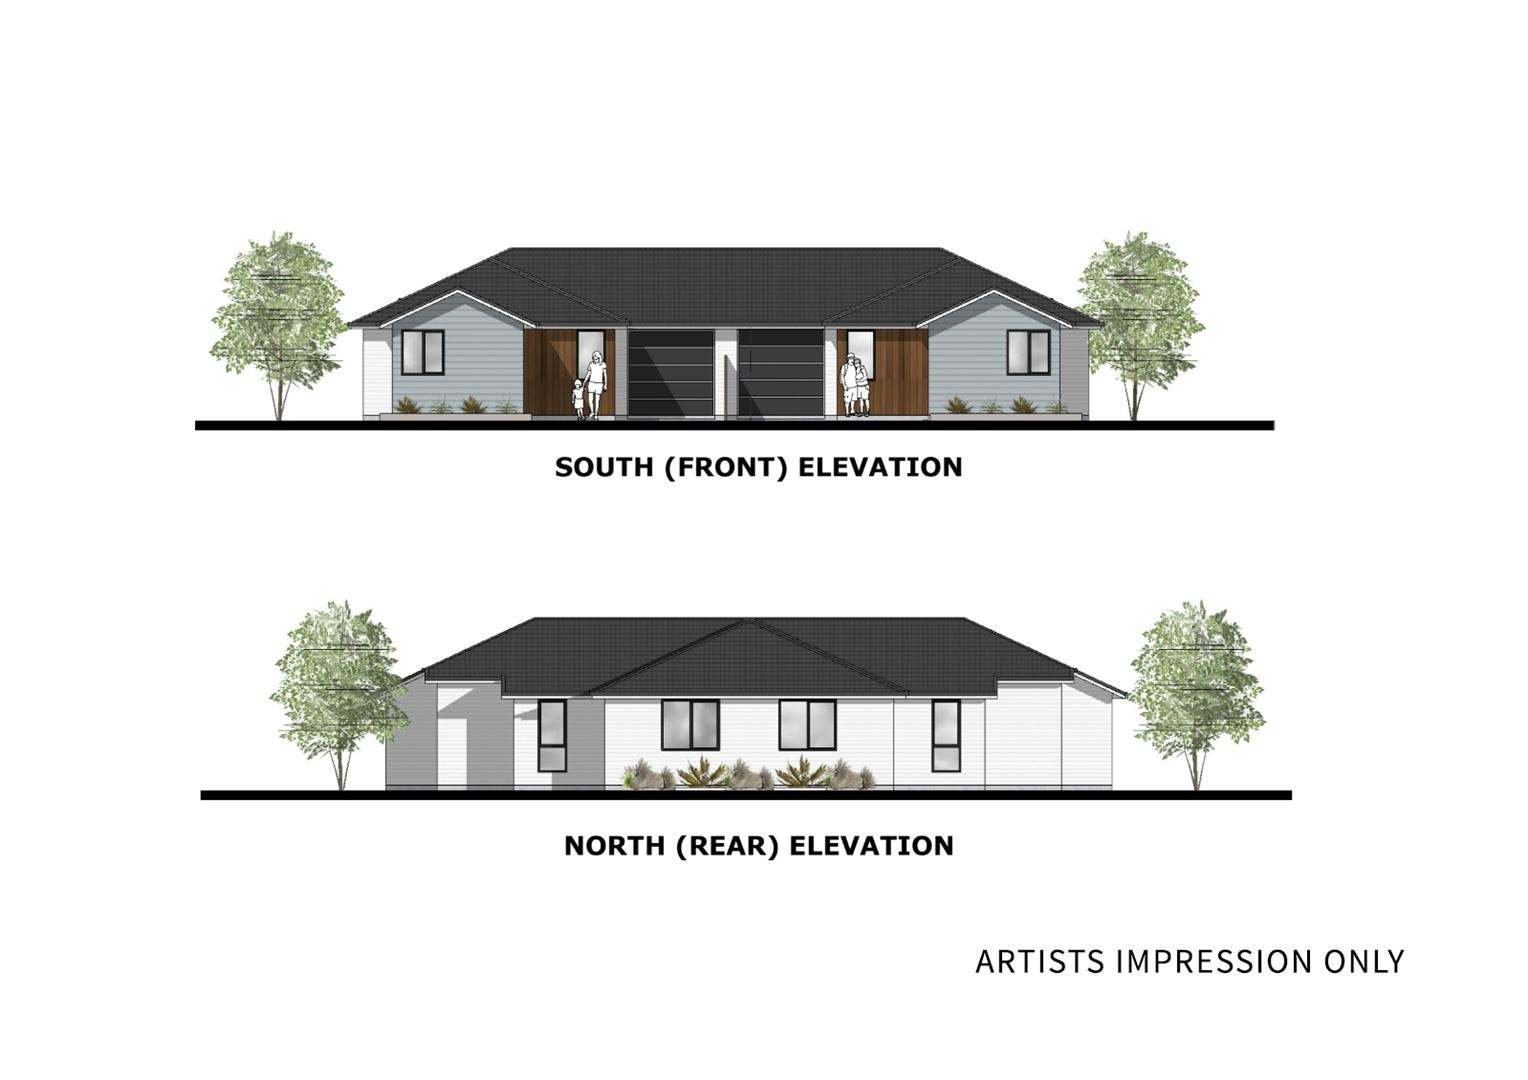 Rototuna North 3房 Freehold - Elite - Location